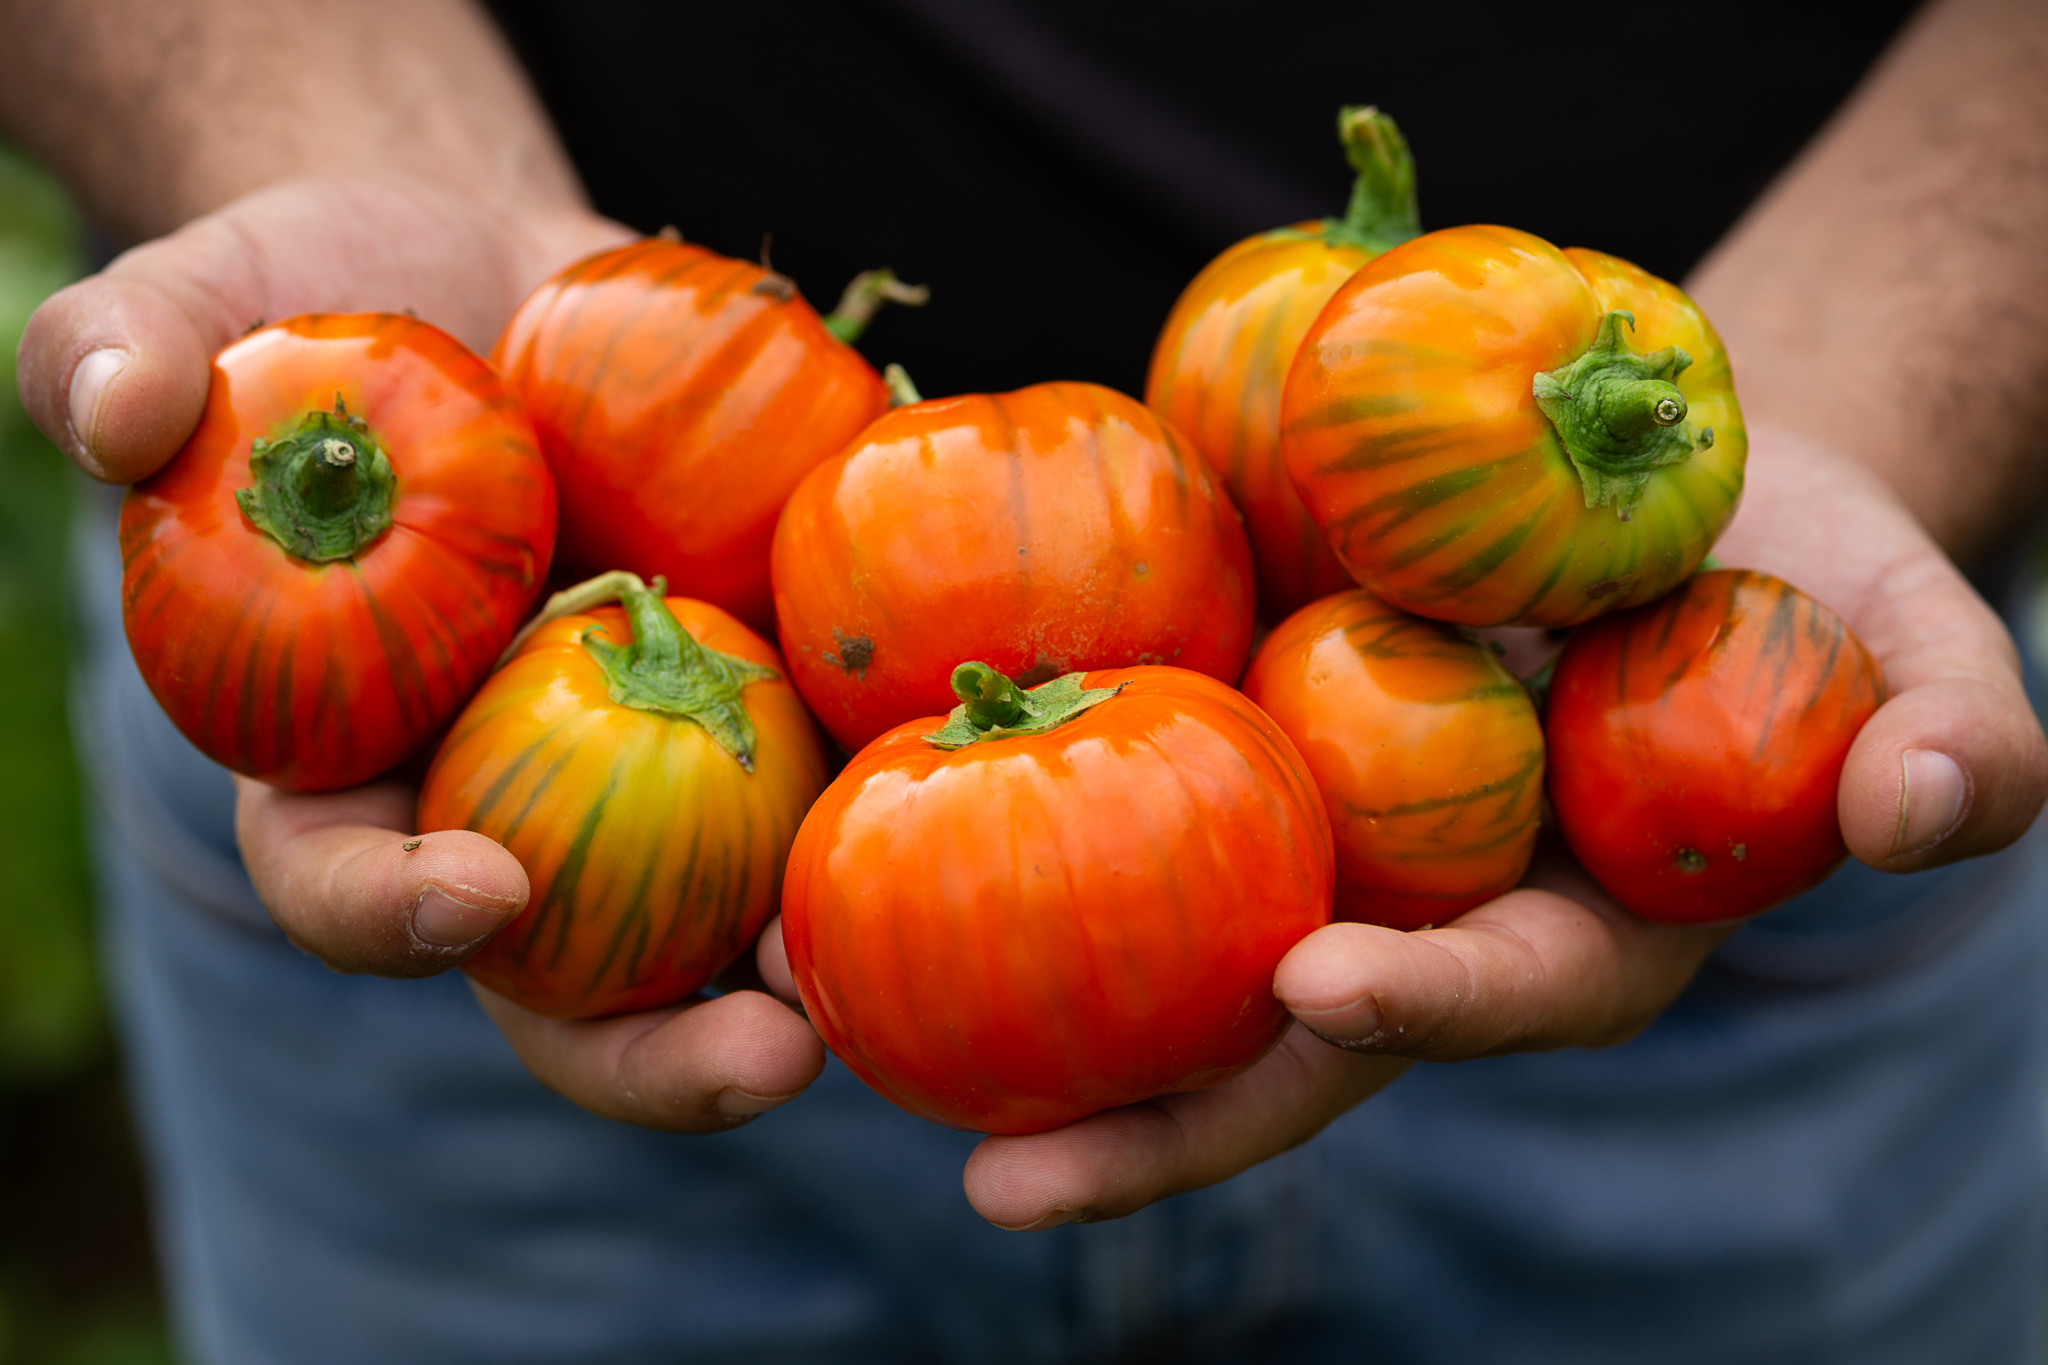 La Melanzana rossa di Rotonda. D.O.P.-Gemüse aus Kalabrien.